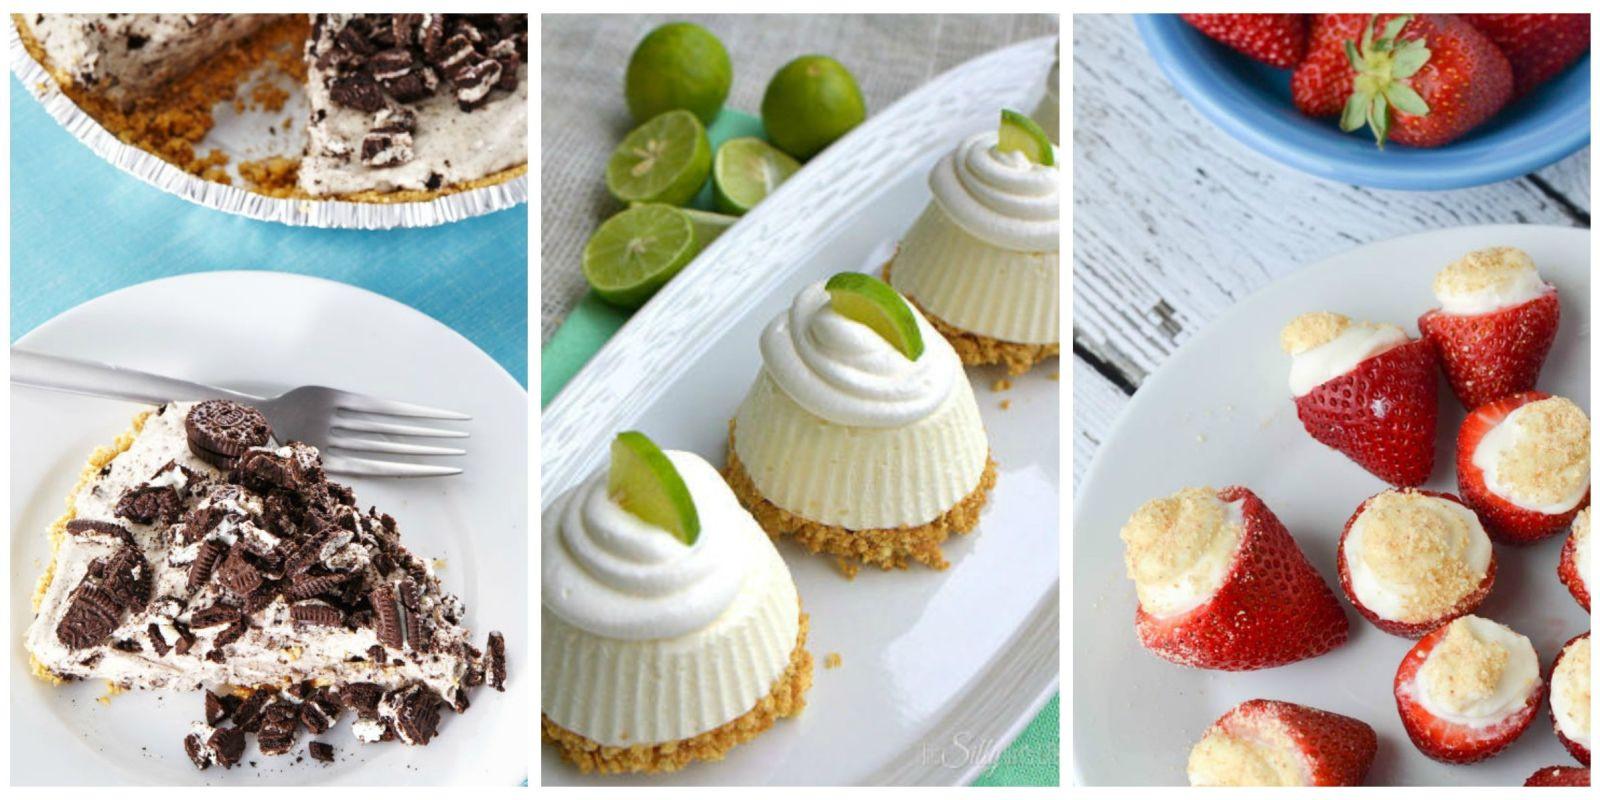 Best Summer Dessert Recipes  57 Easy Summer Desserts Best Recipes for Frozen Summer